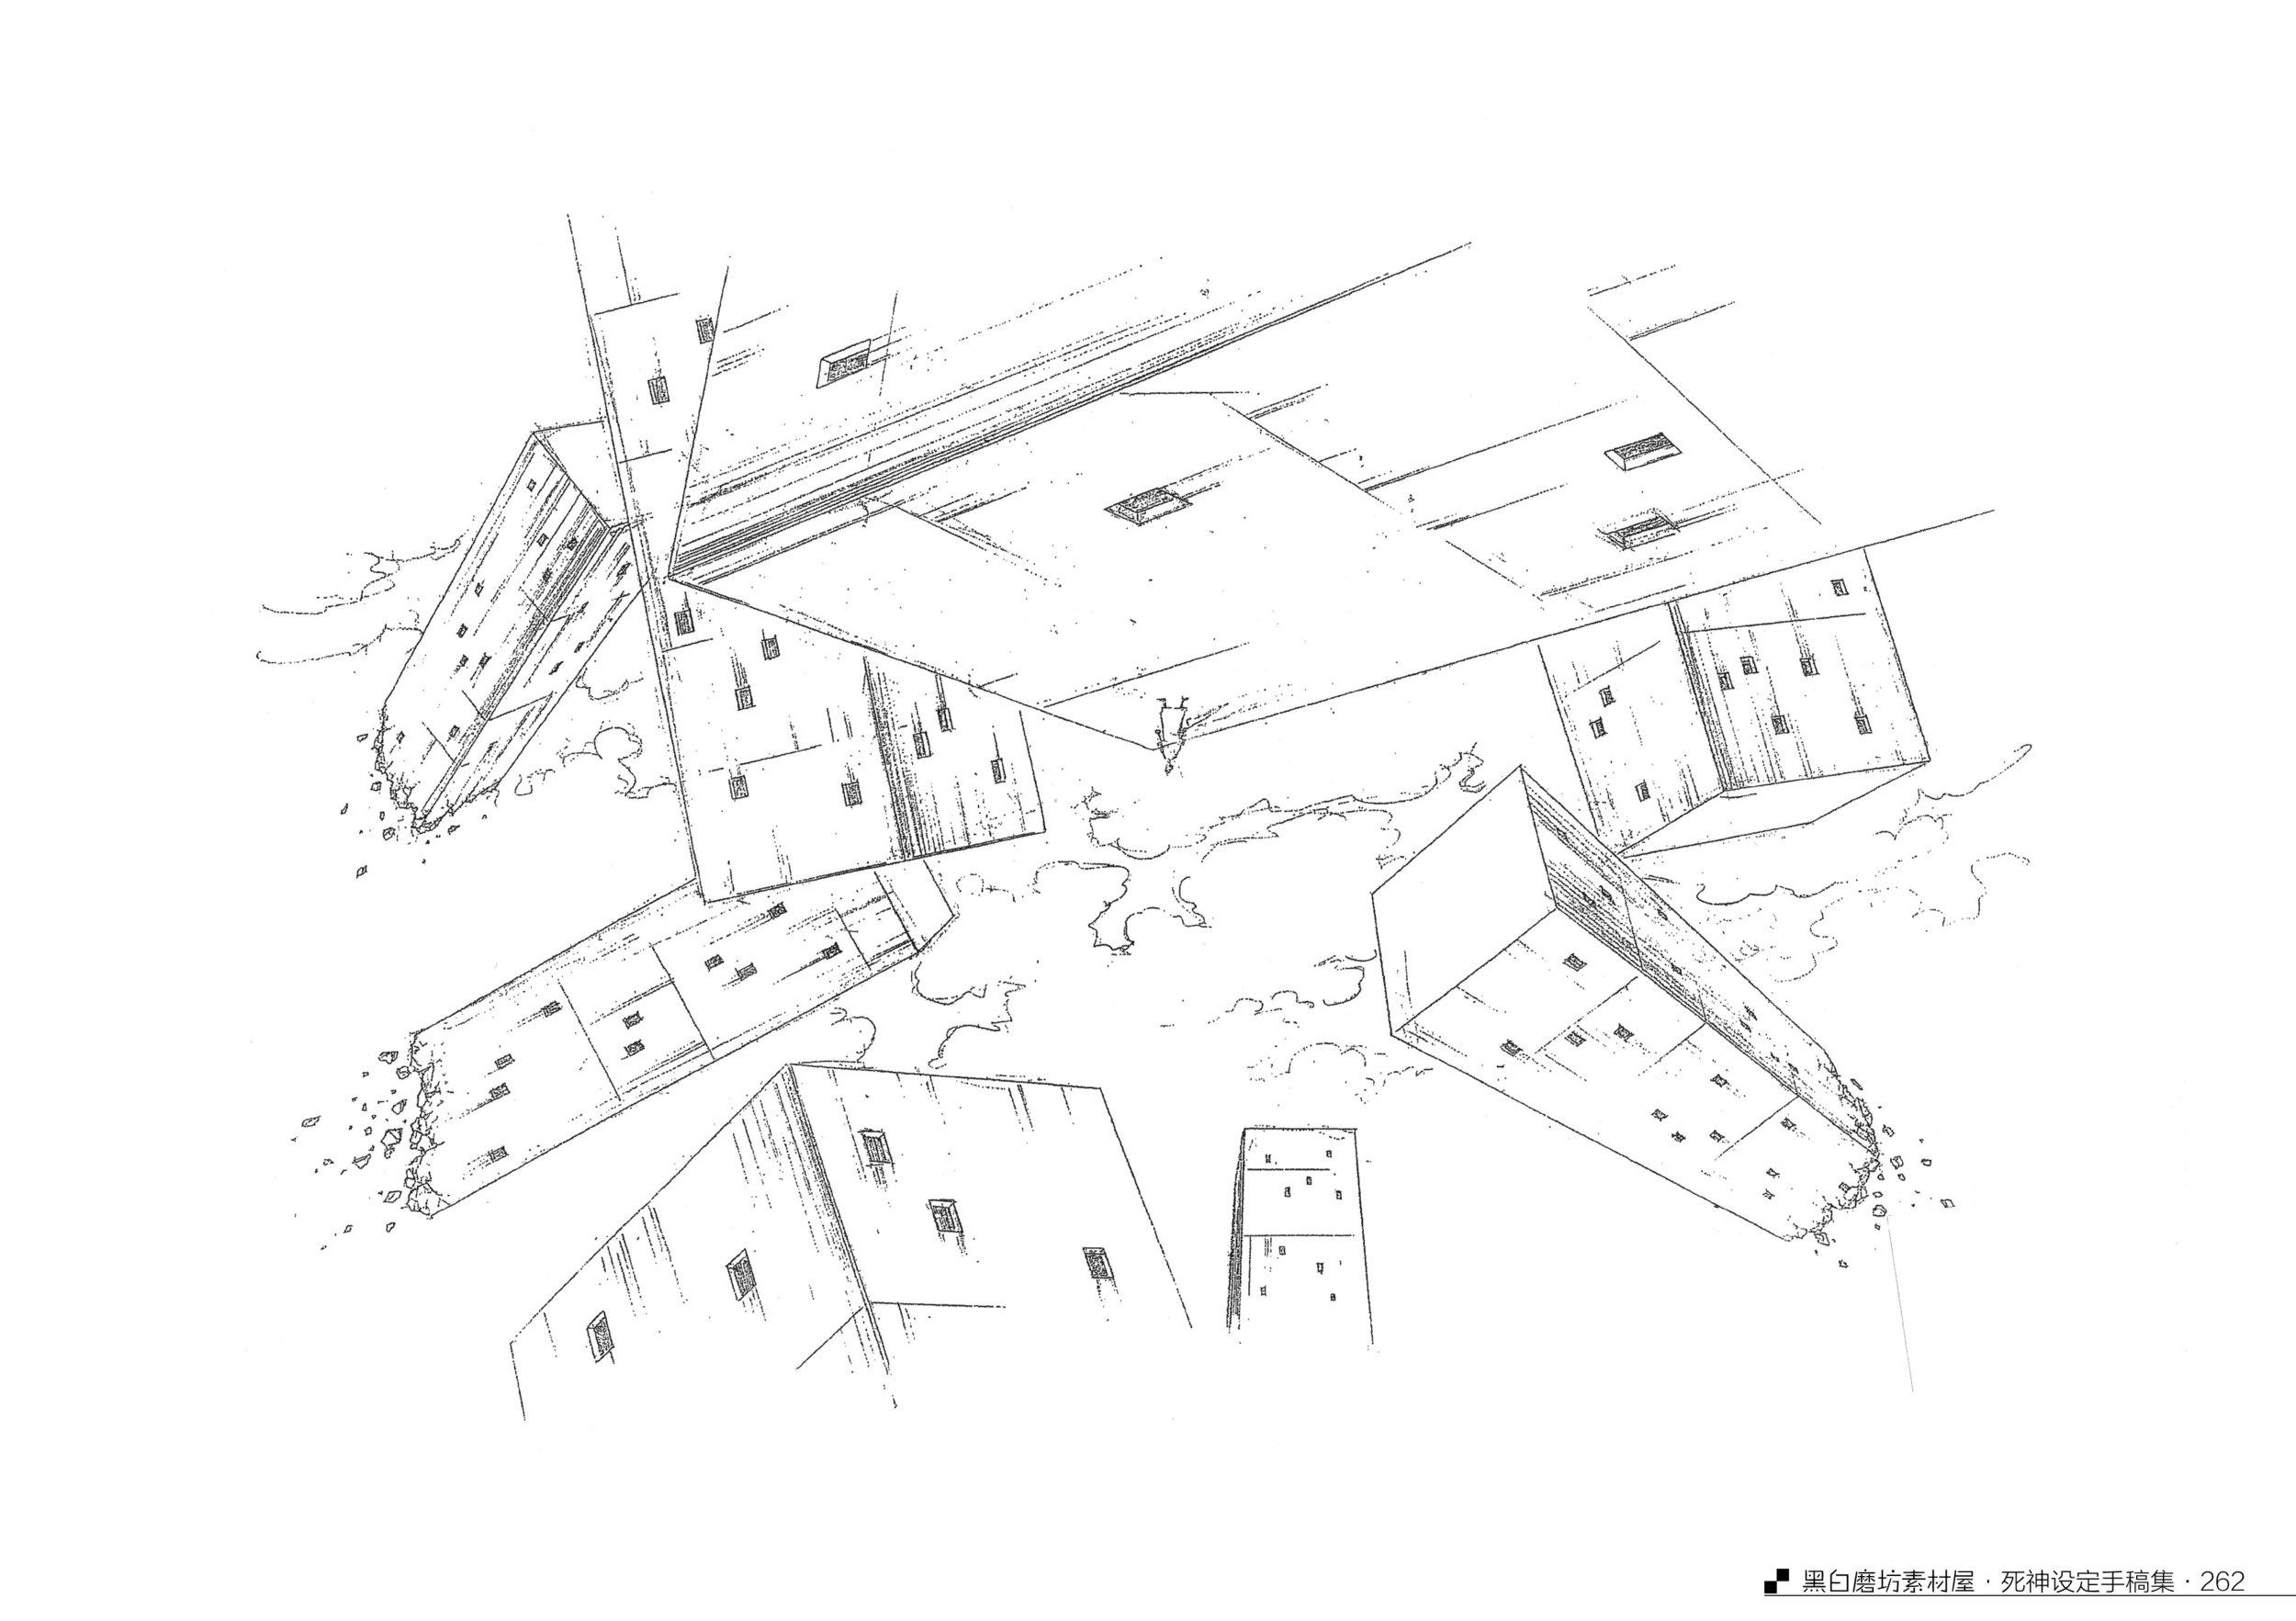 Art of the Bleach C - 26.jpg